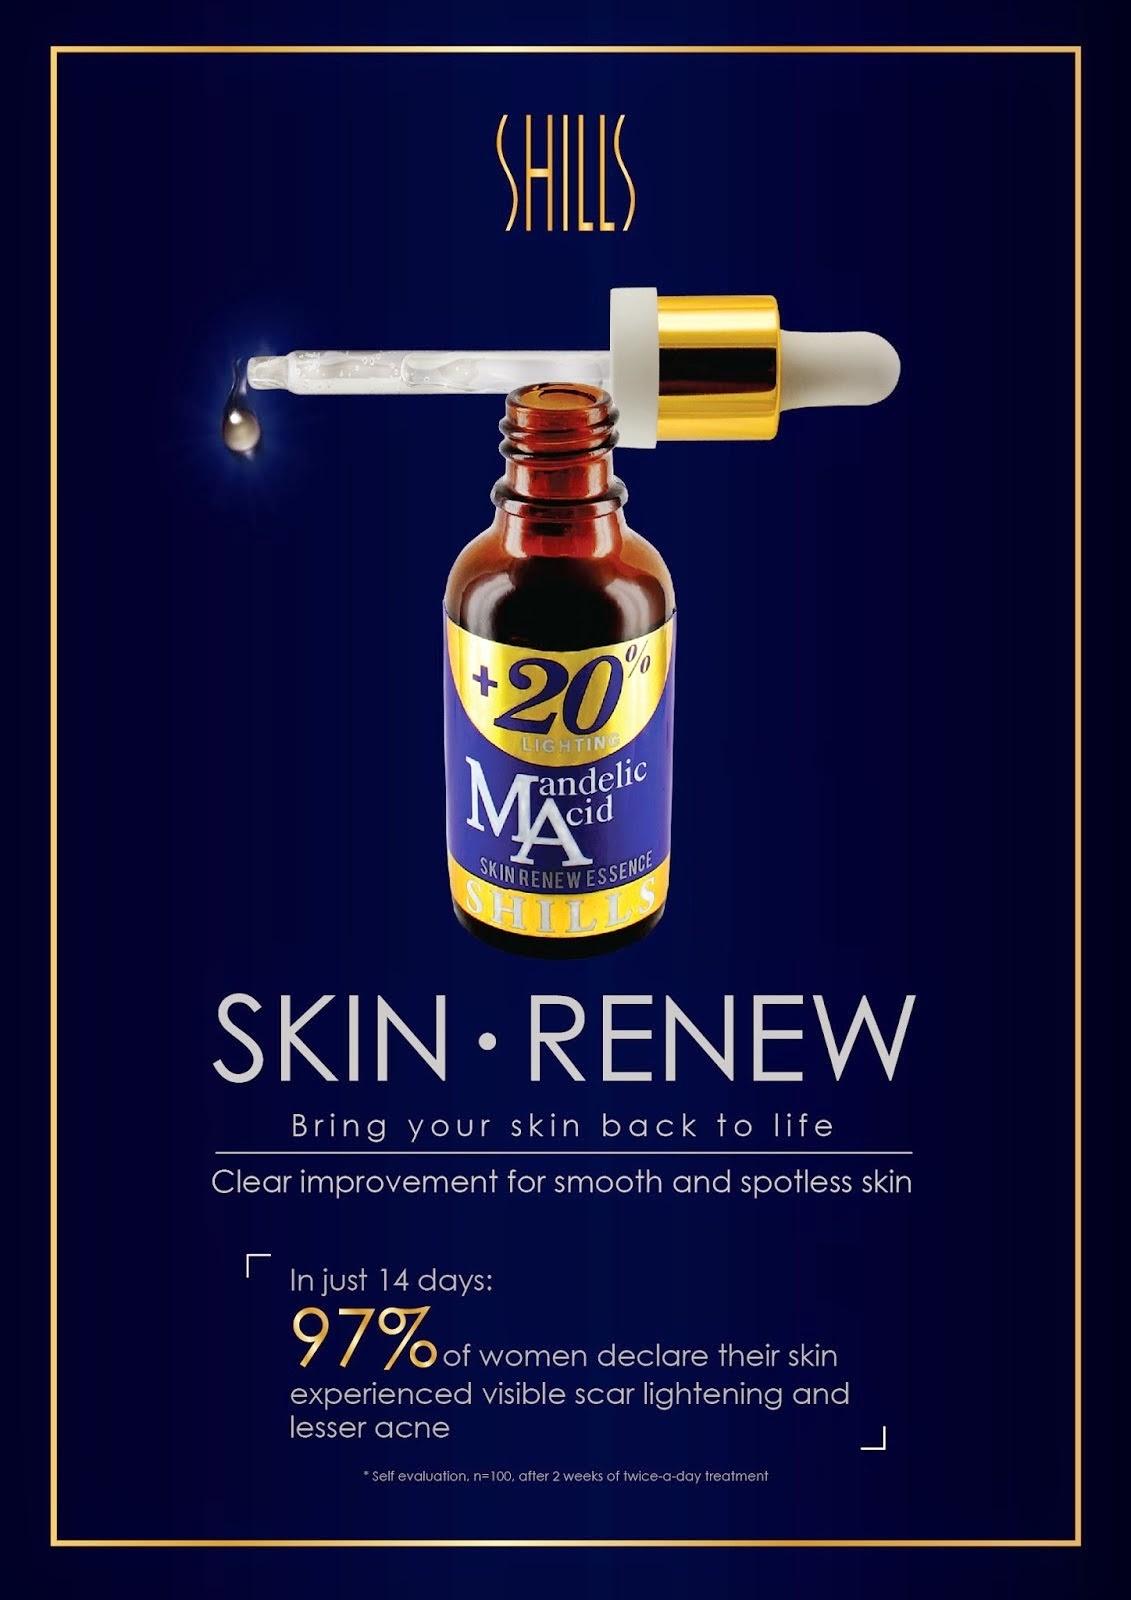 PRE ORDER SHILLS Mandelic Acid 20% Skin Renew Essence 30ml